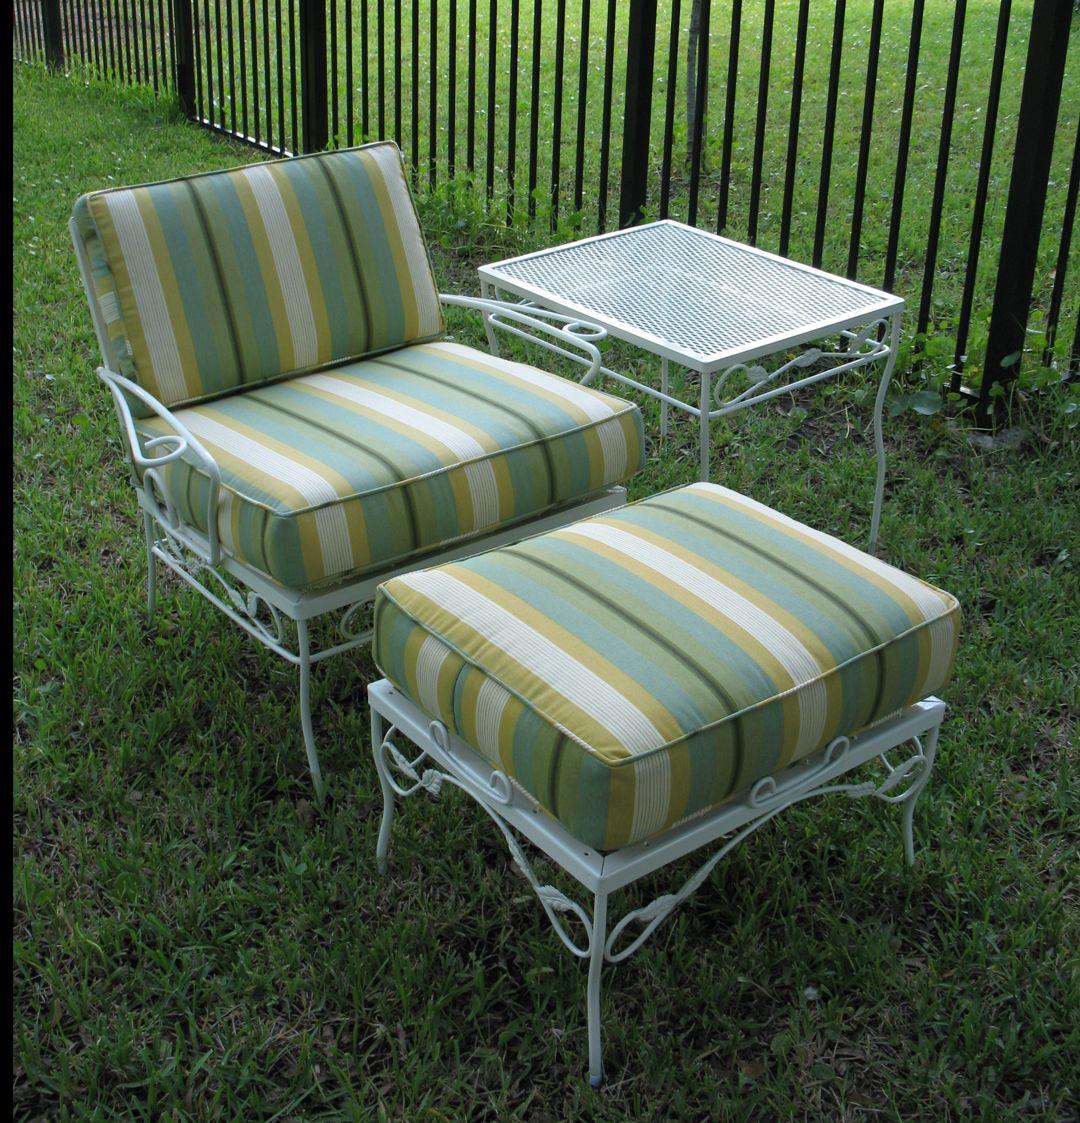 Vintage metal furniture vintage patio furniture mulberry street